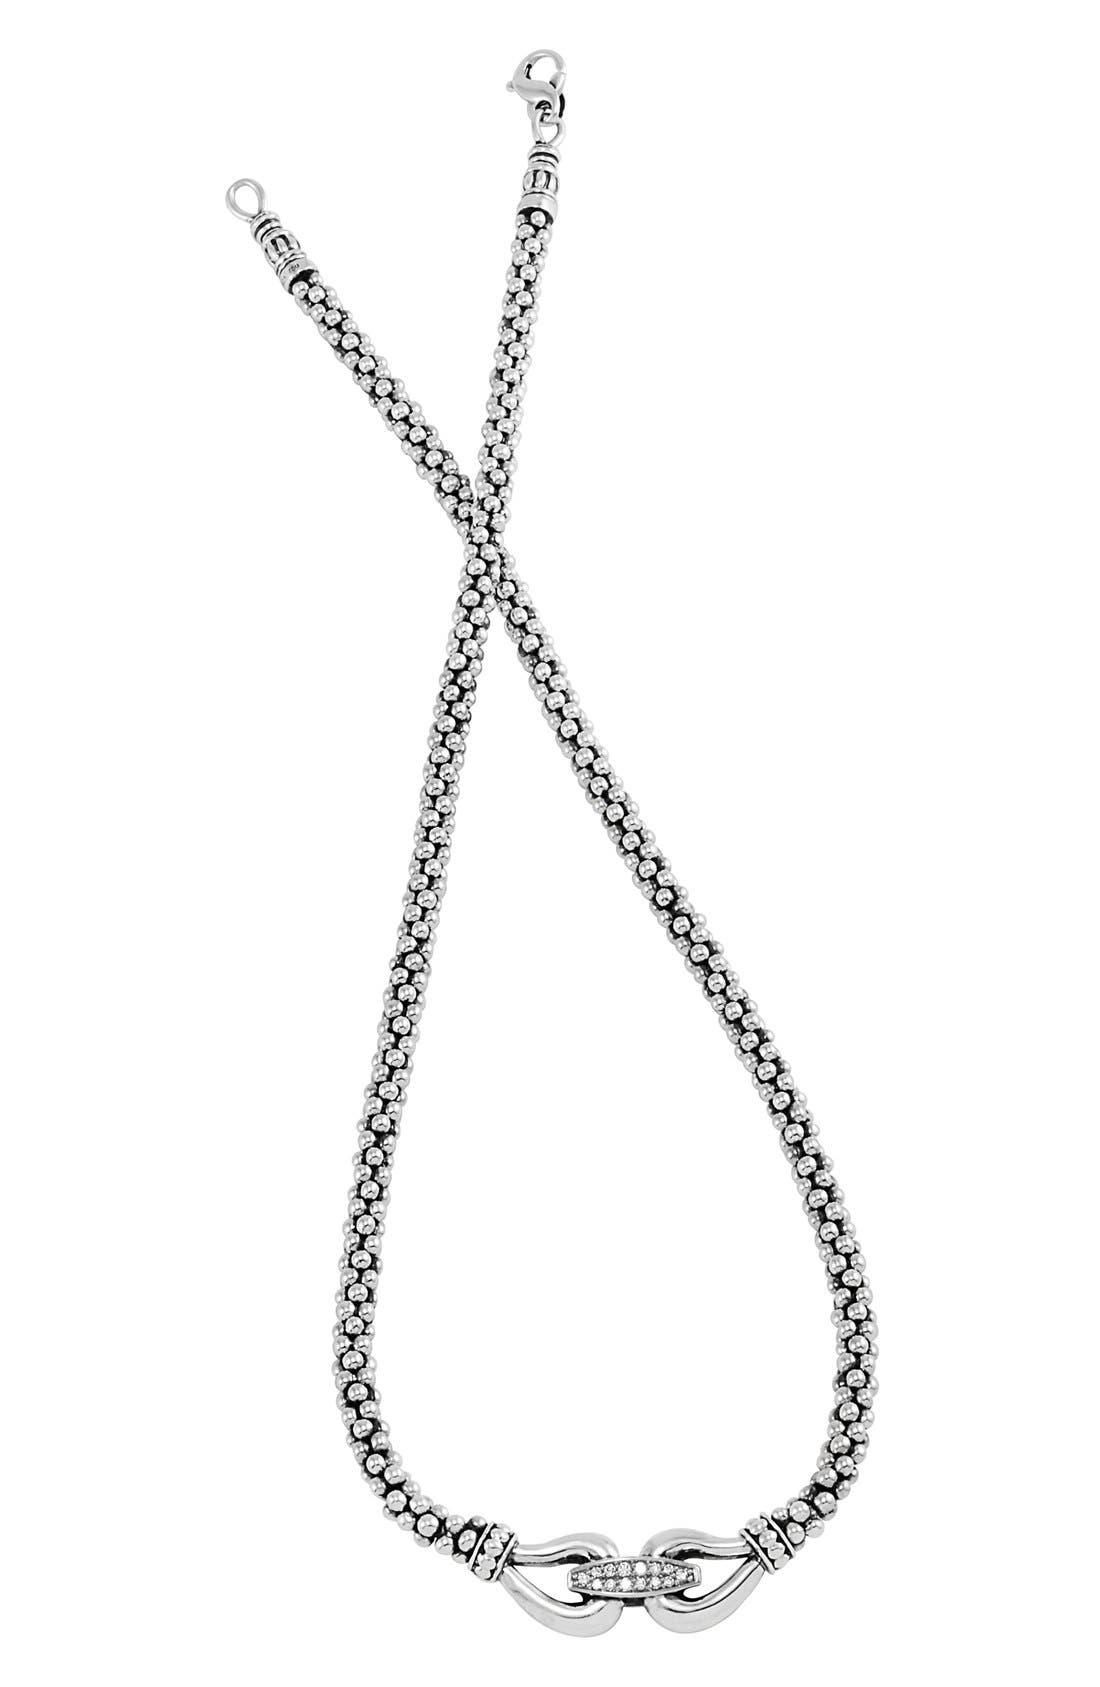 'Derby' Diamond Strand Necklace,                             Main thumbnail 1, color,                             040